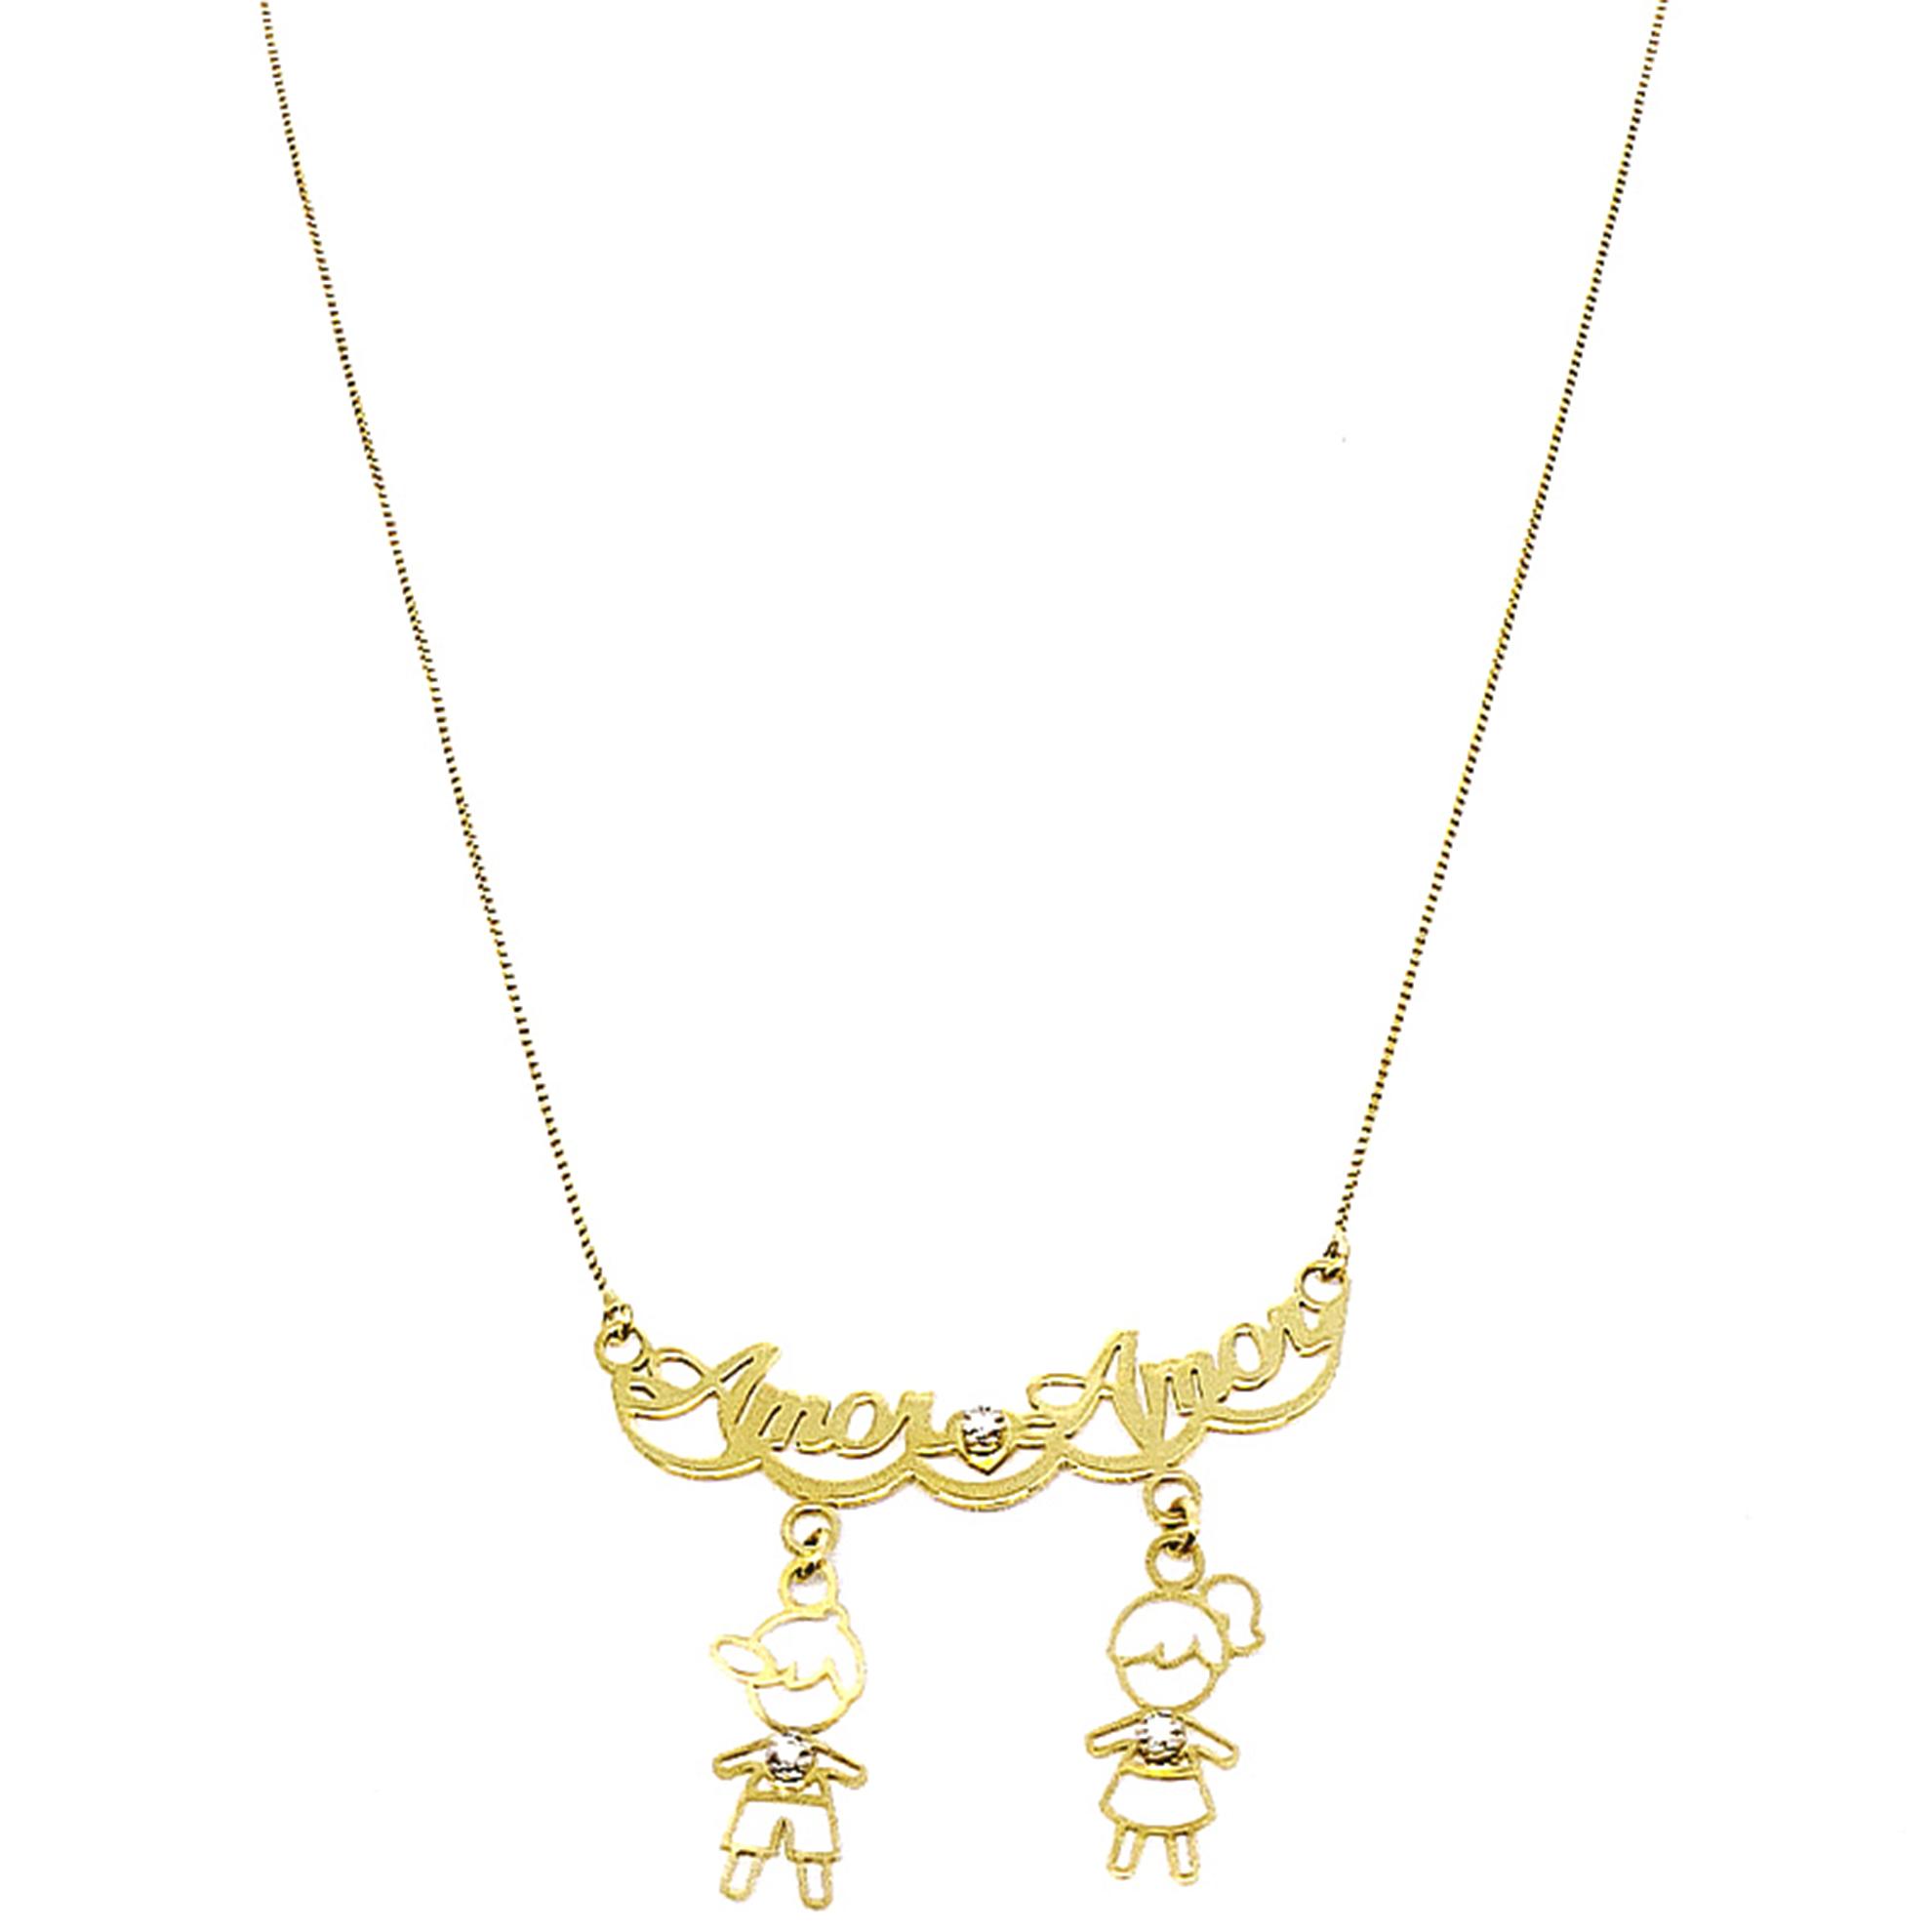 Gargantilha Amor c/ Casal Pendurado em Ouro 18 Kilates